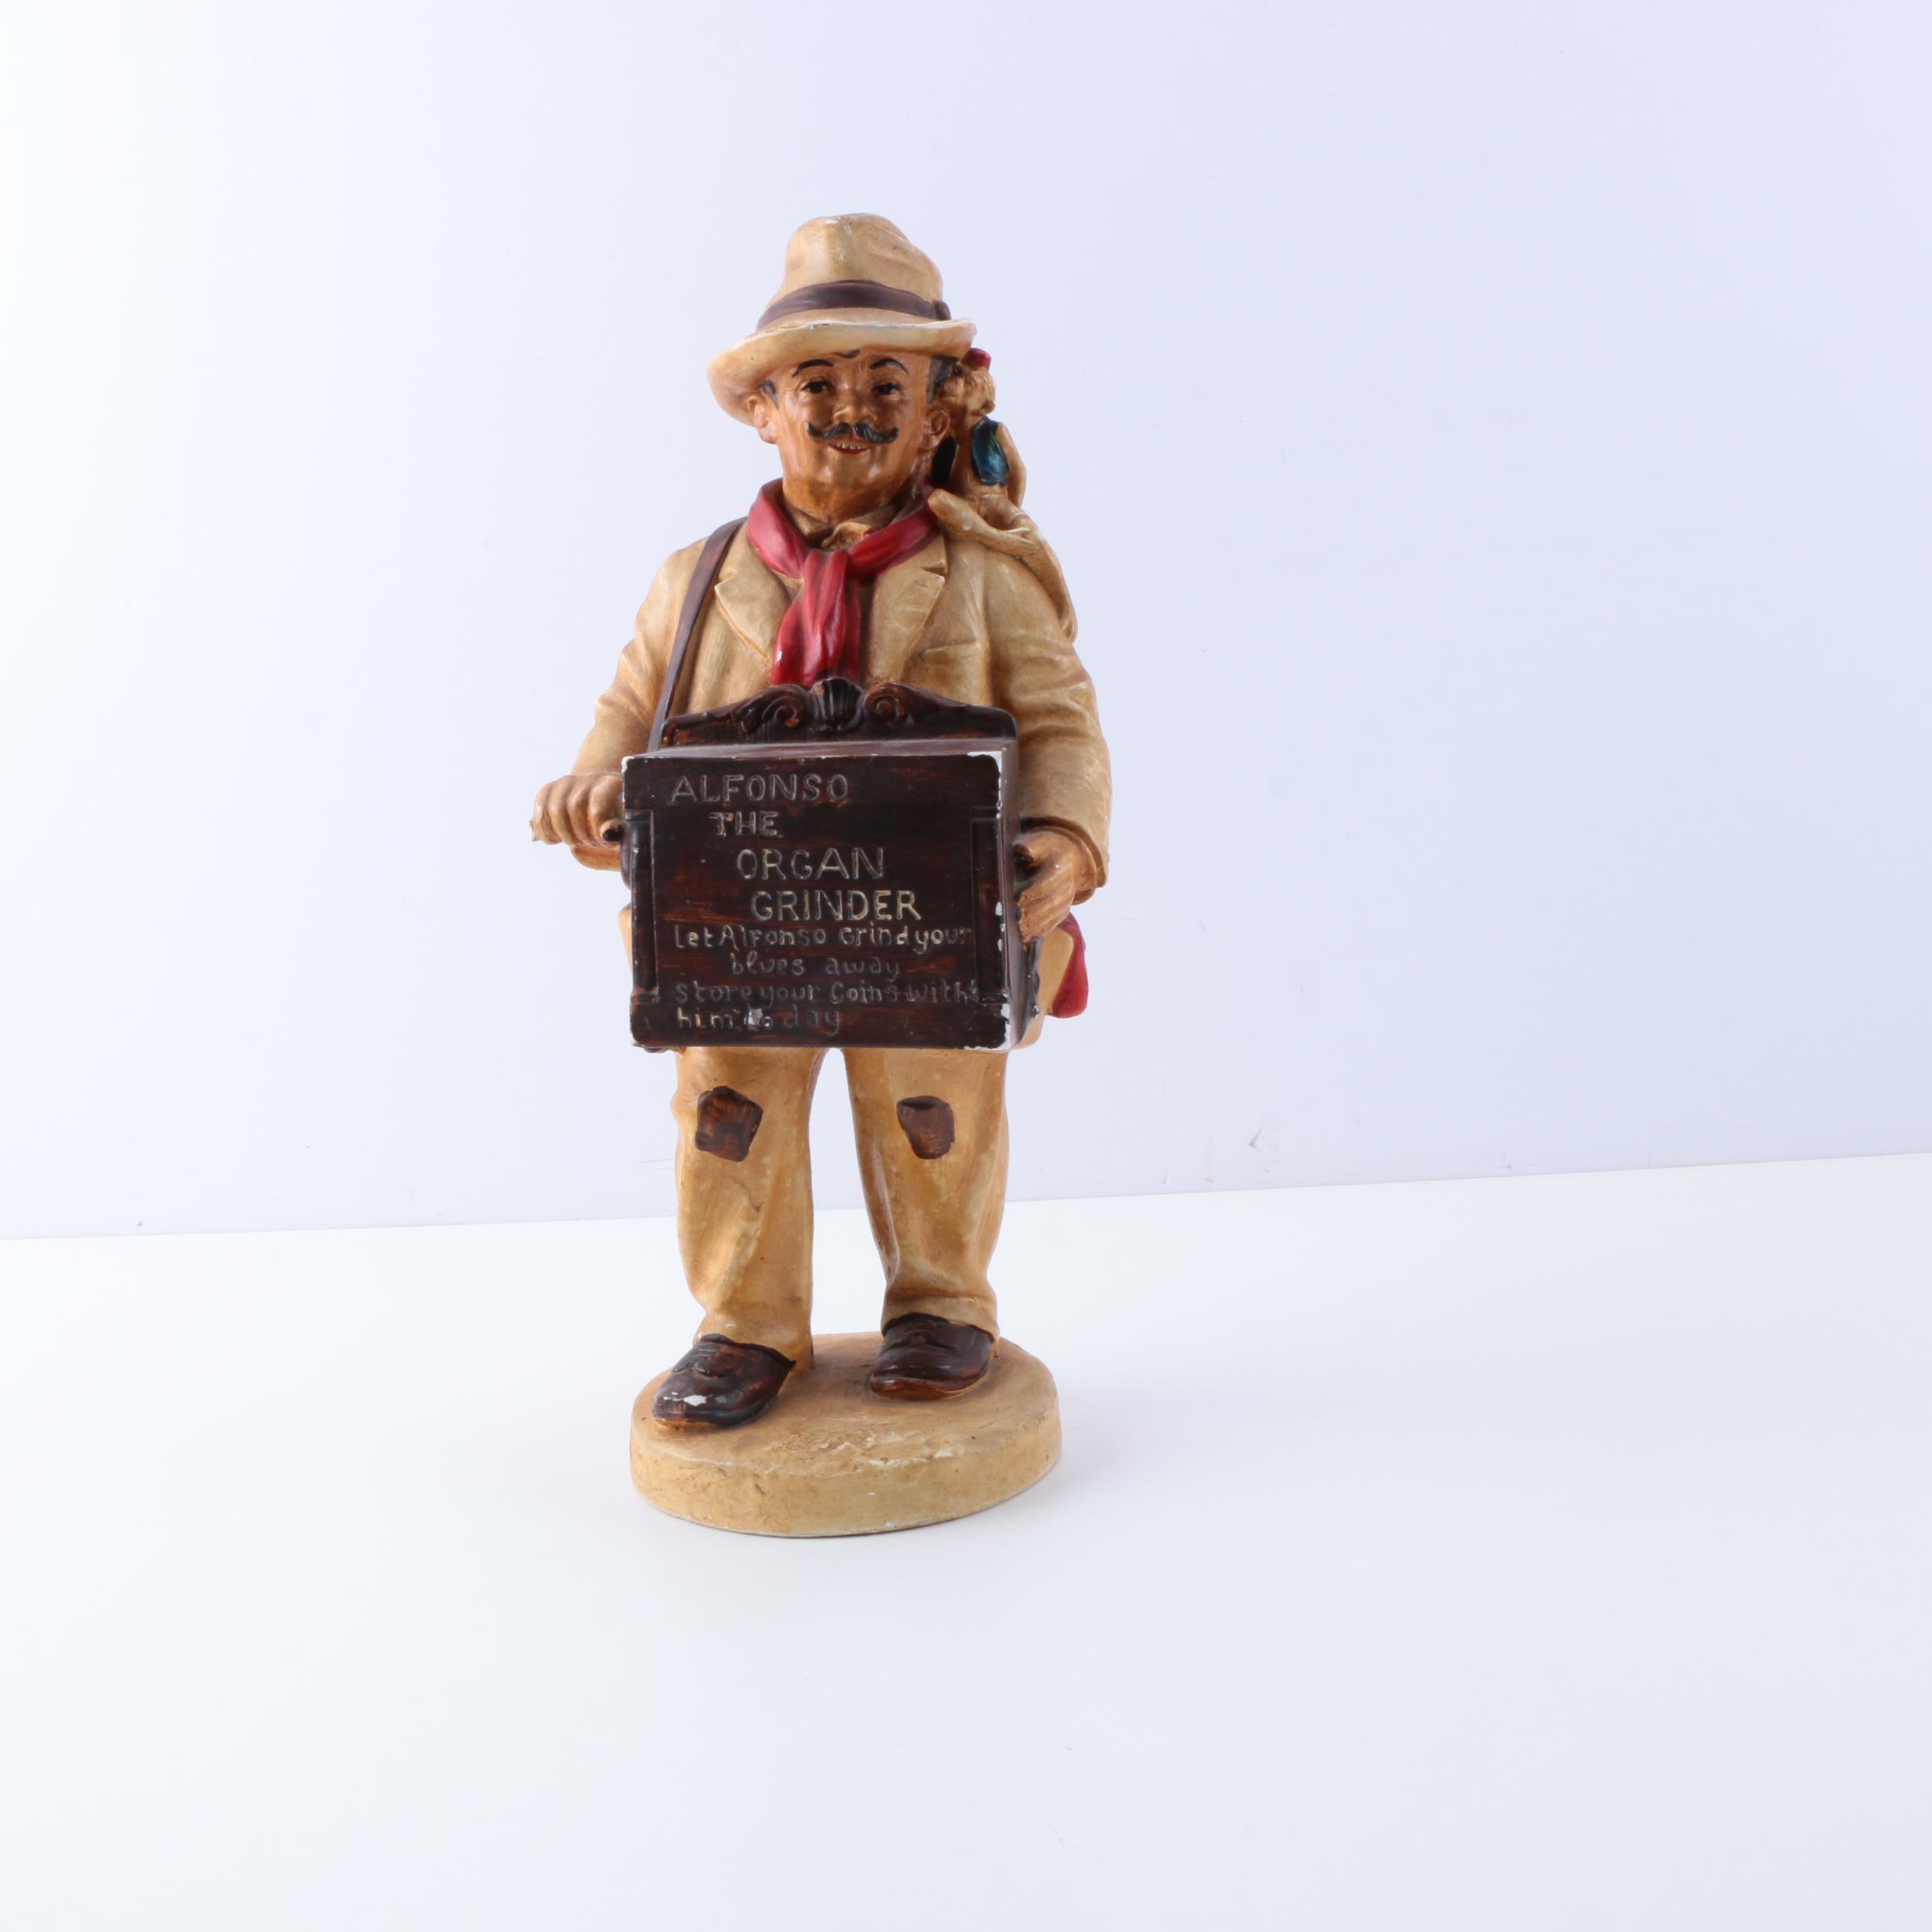 Alfonso the Organ Grinder Figurine